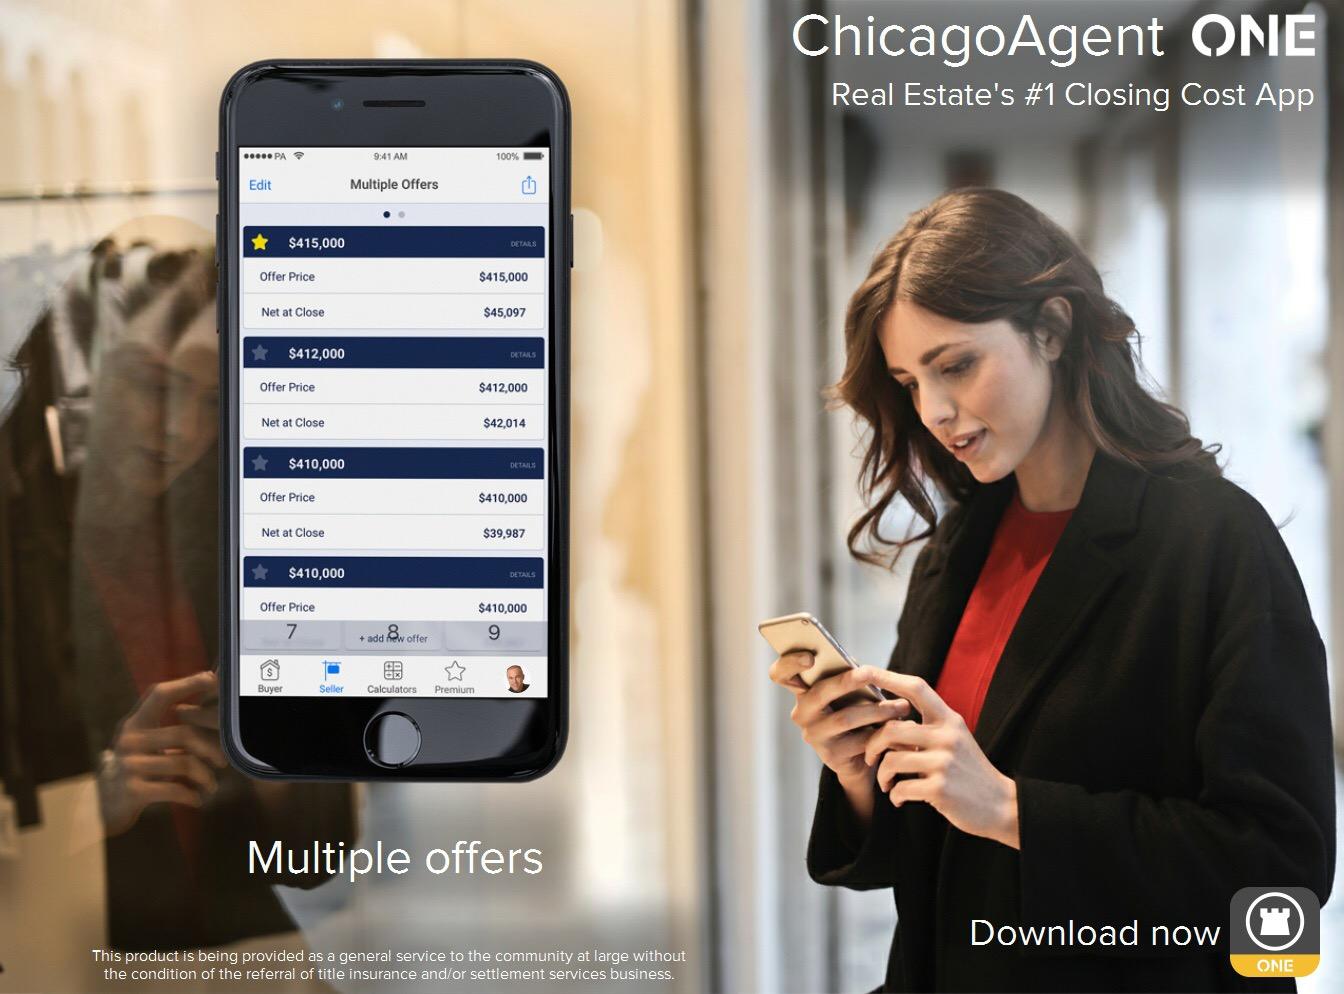 ChicagoAgentImg